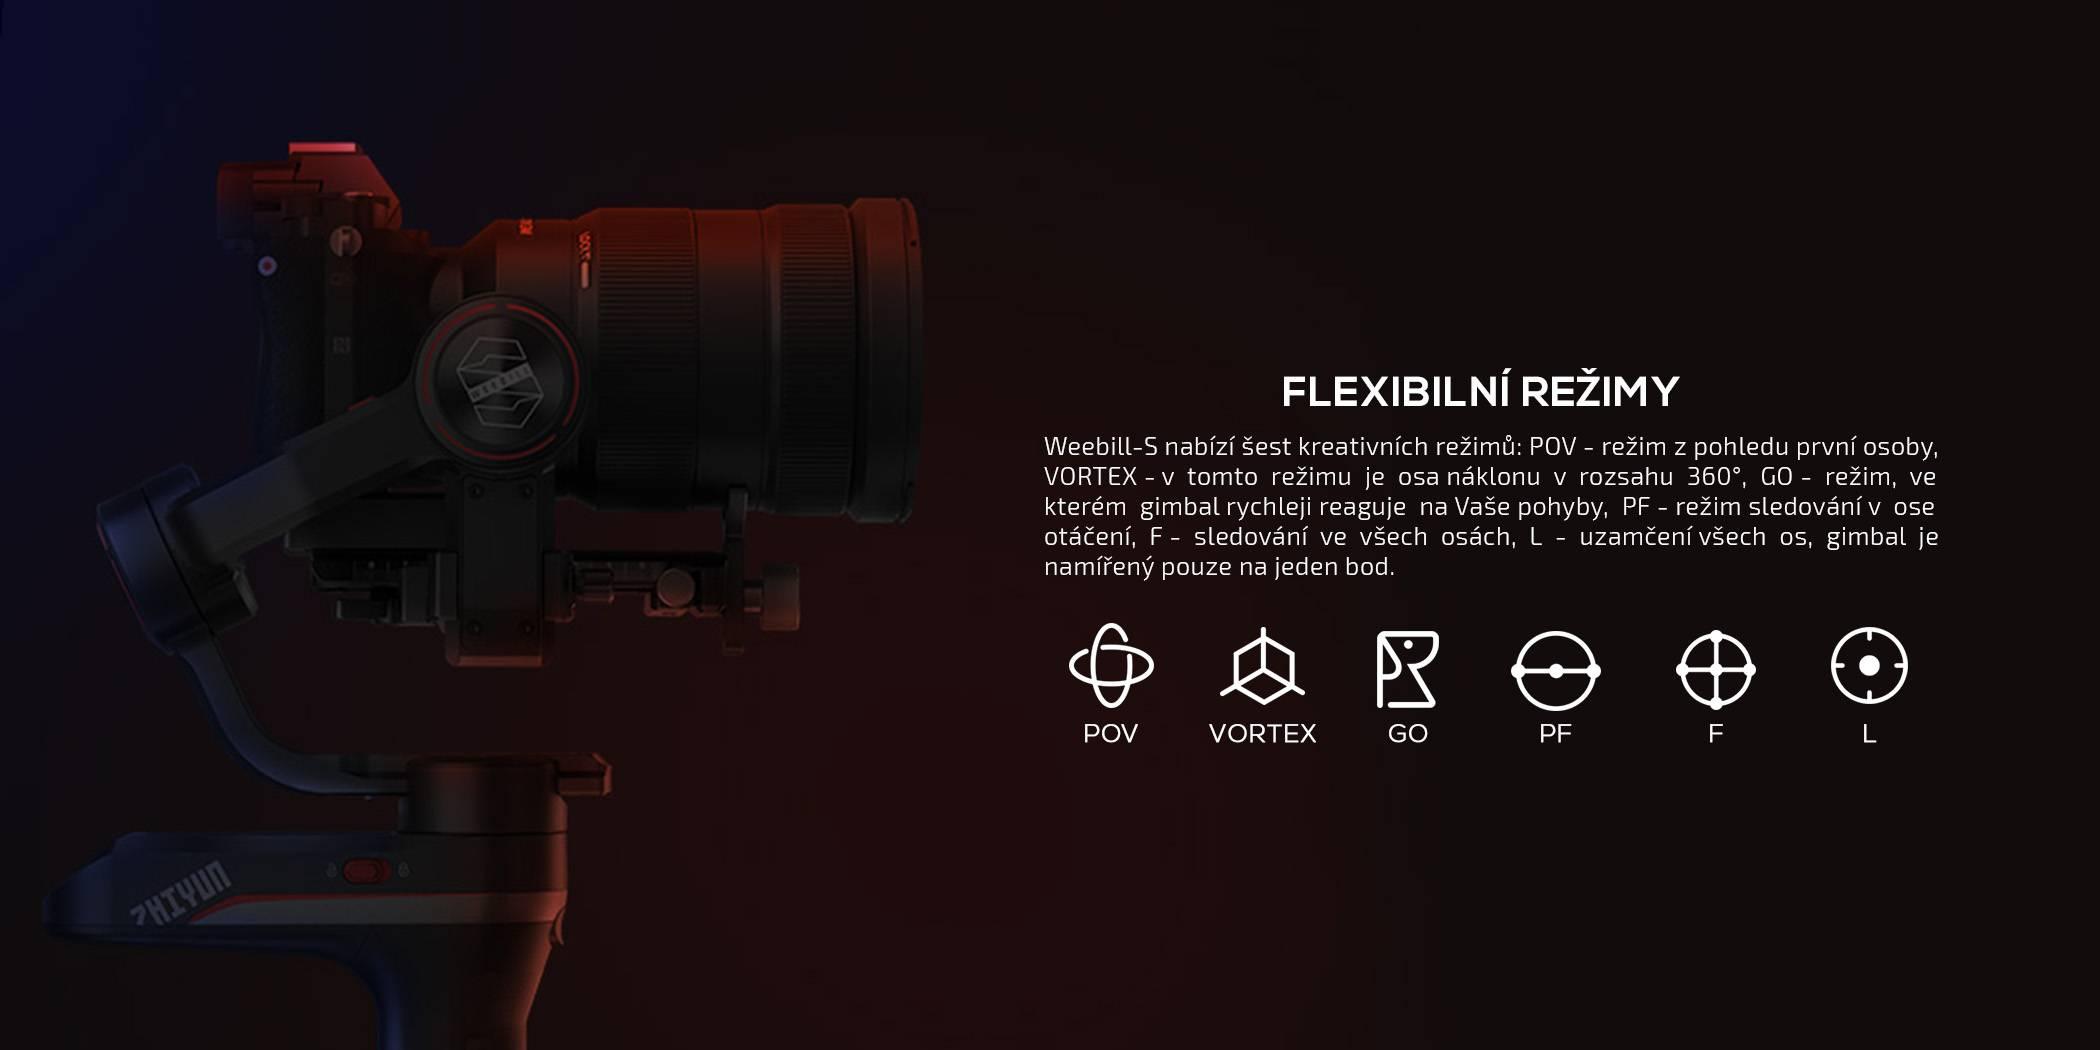 film-technika-zhiyun-weebill-s-režimy_1